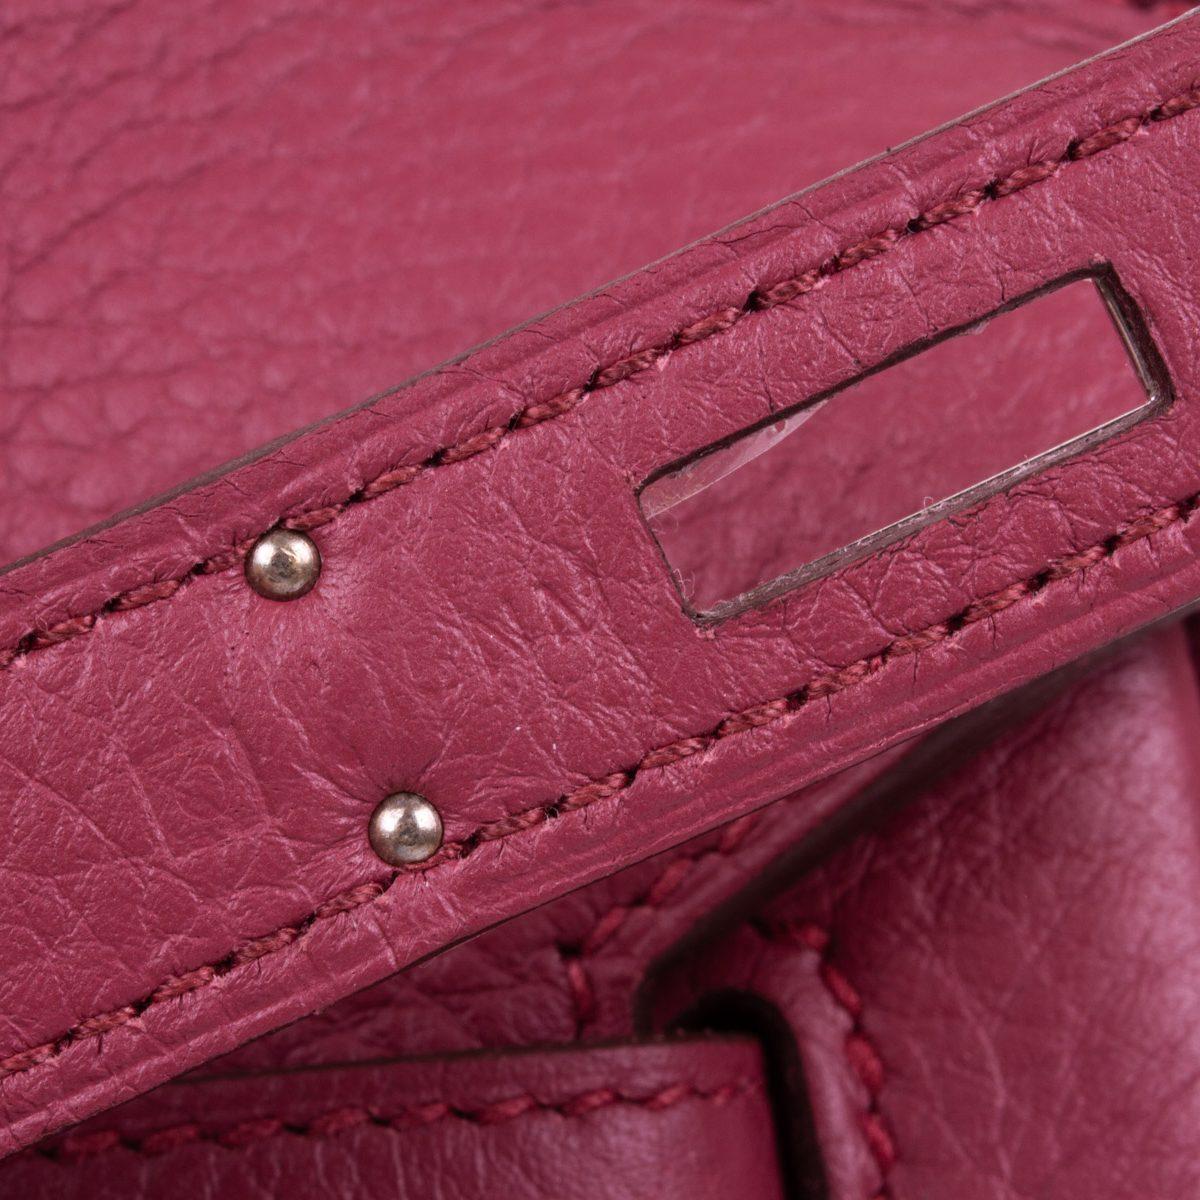 7203db3aa681 Birkin 35 Bois de Rose Taurillon Clémence by Hermès - Le Dressing Monaco